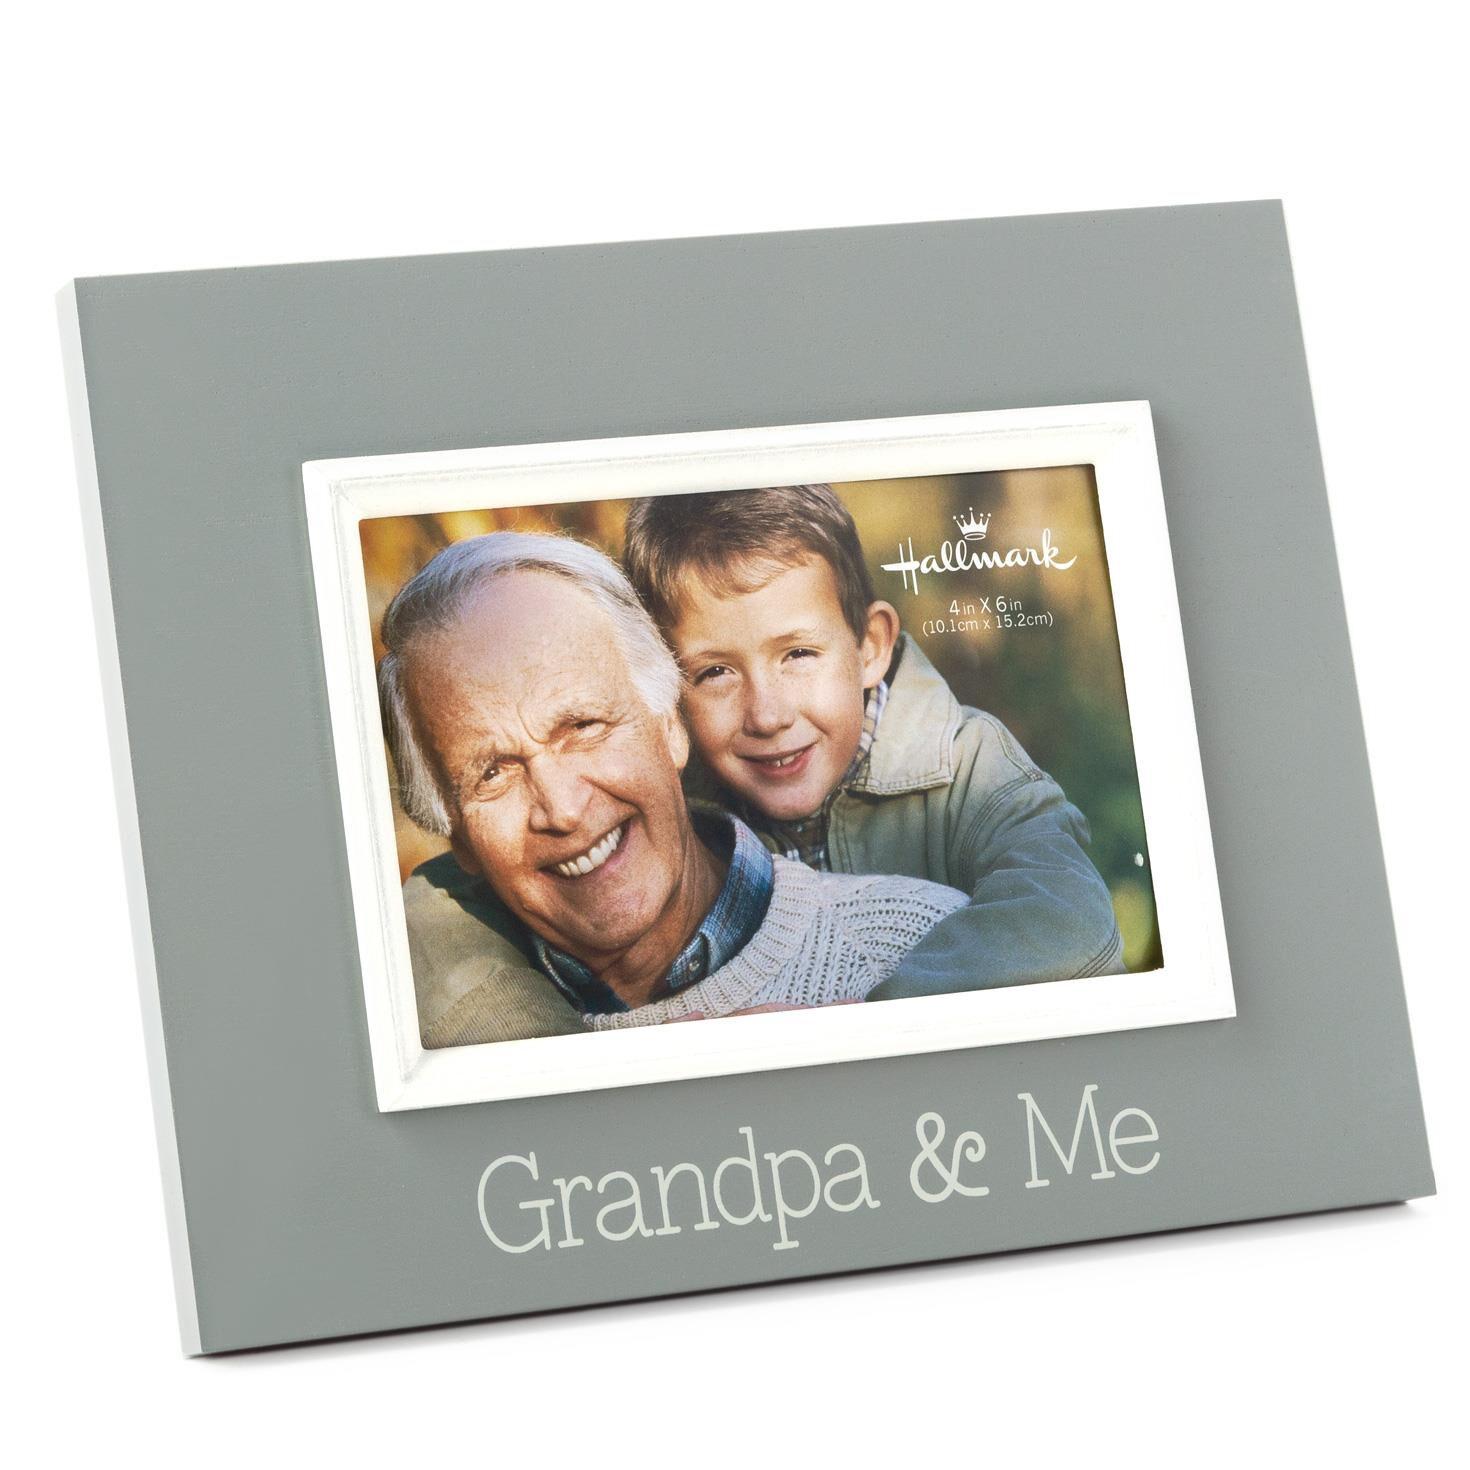 grandpa me wood malden picture frame 4x6 picture frames hallmark